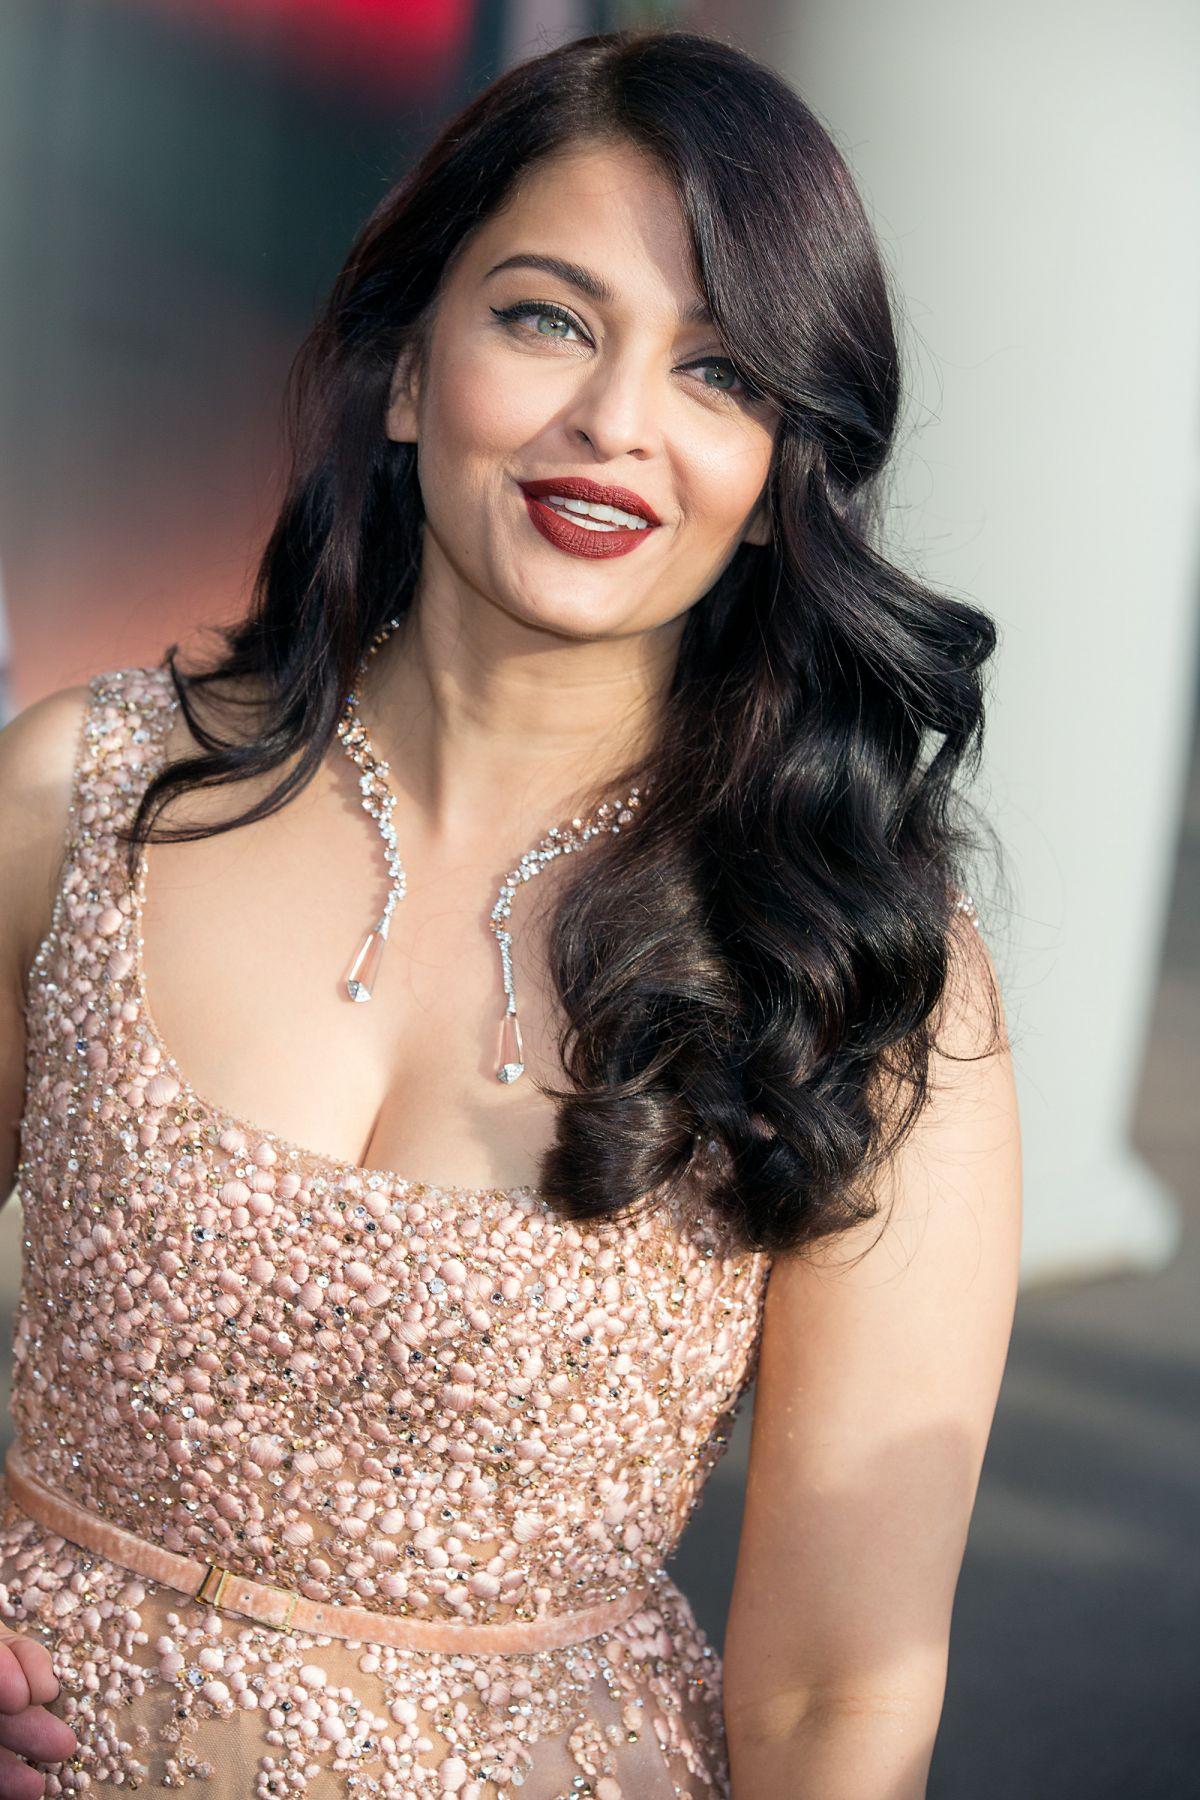 AISHWARAYA RAI BACHCHAN at Hotel Martinez in Cannes 05/13/2016